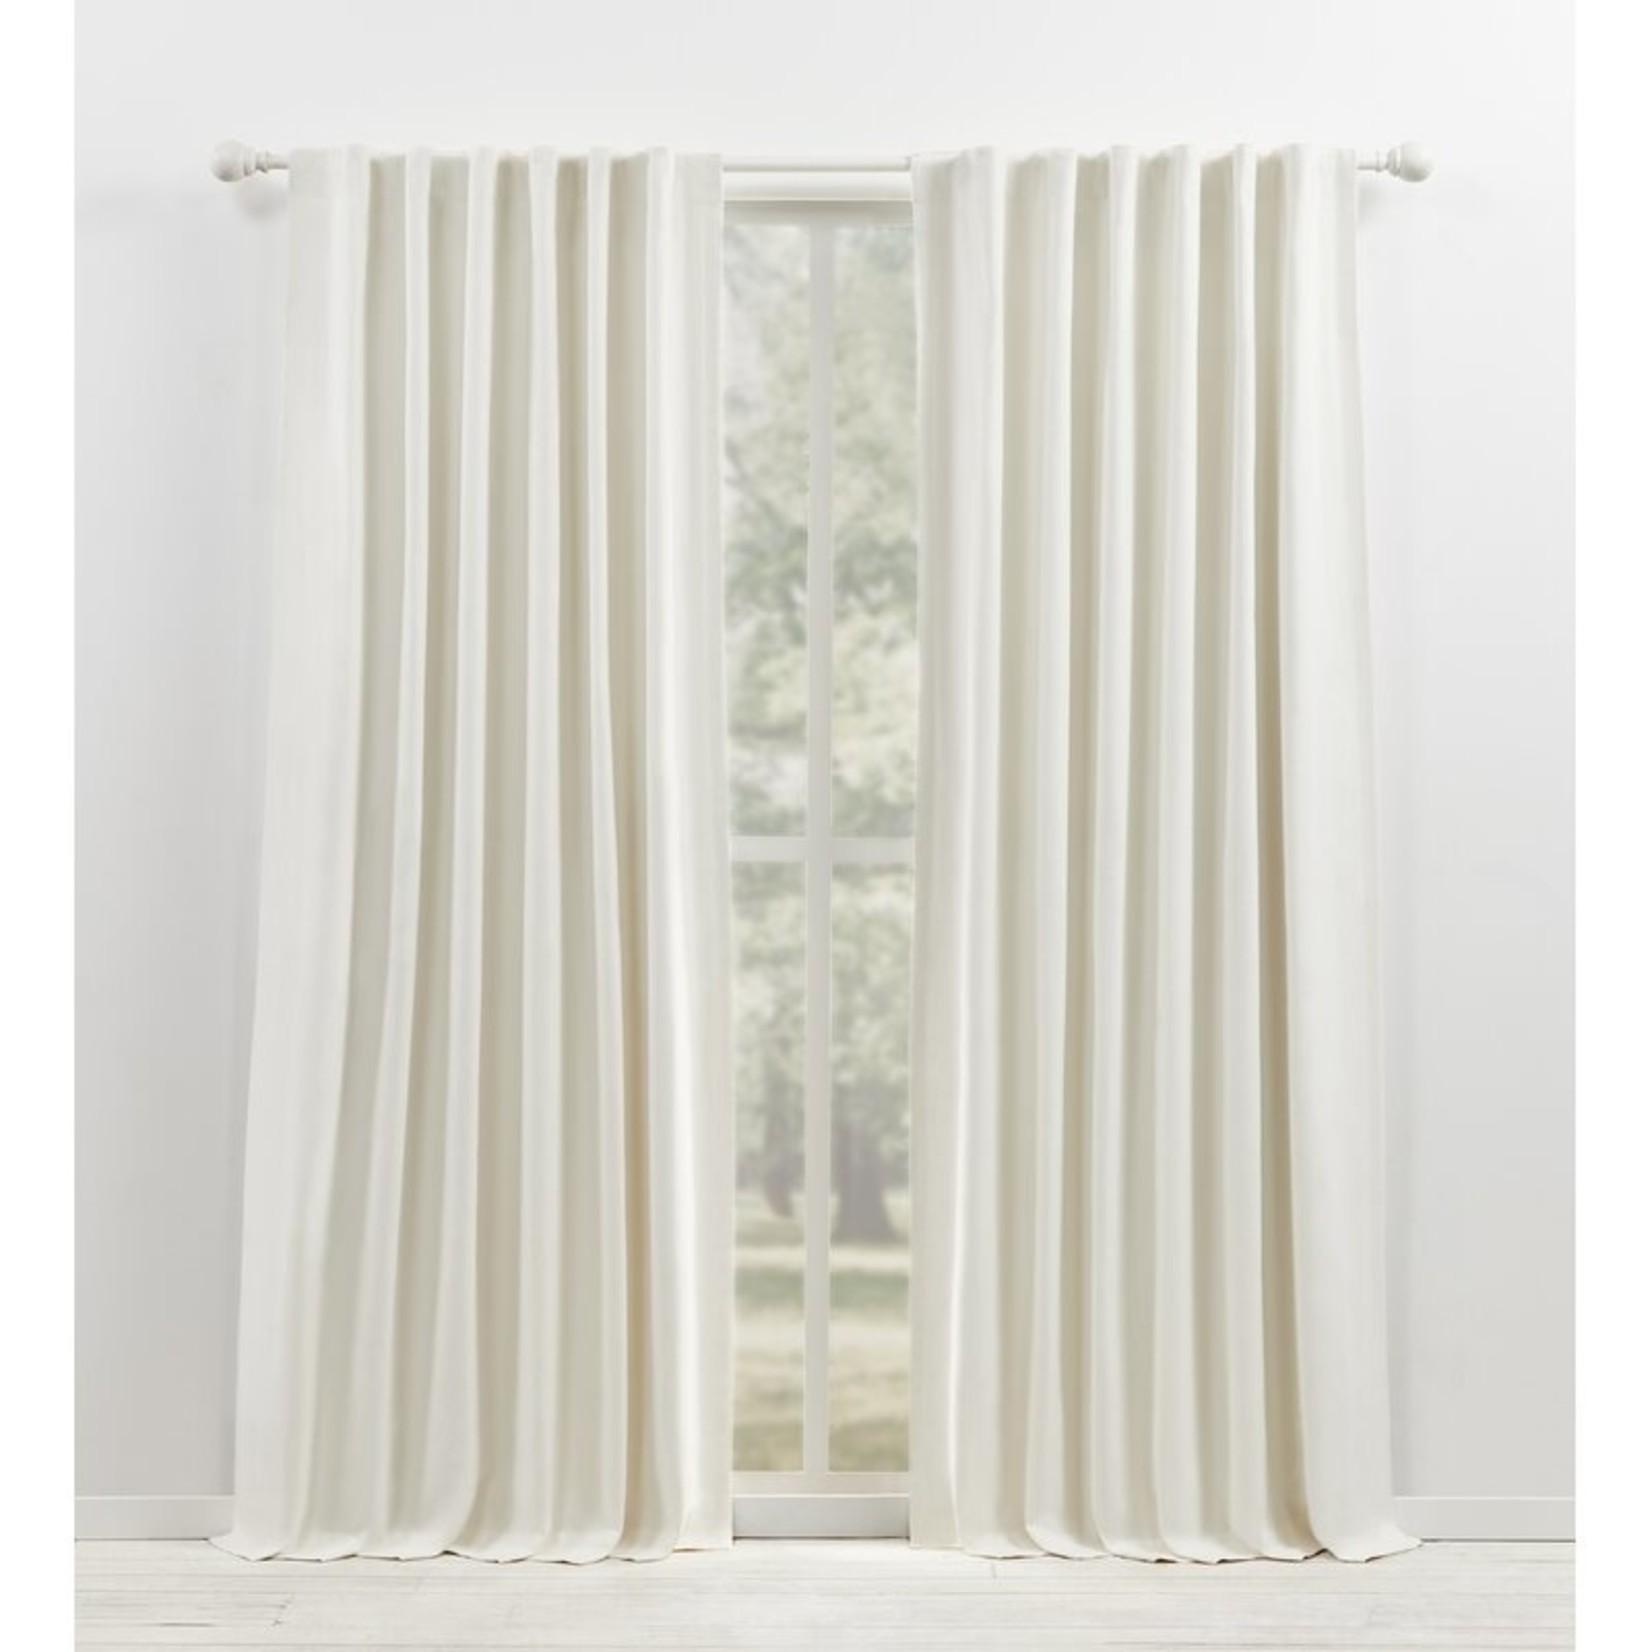 "*52"" x 96"" -Waller 100% Blackout Thermal Rod Pocket Curtain Panels - Set of 2"